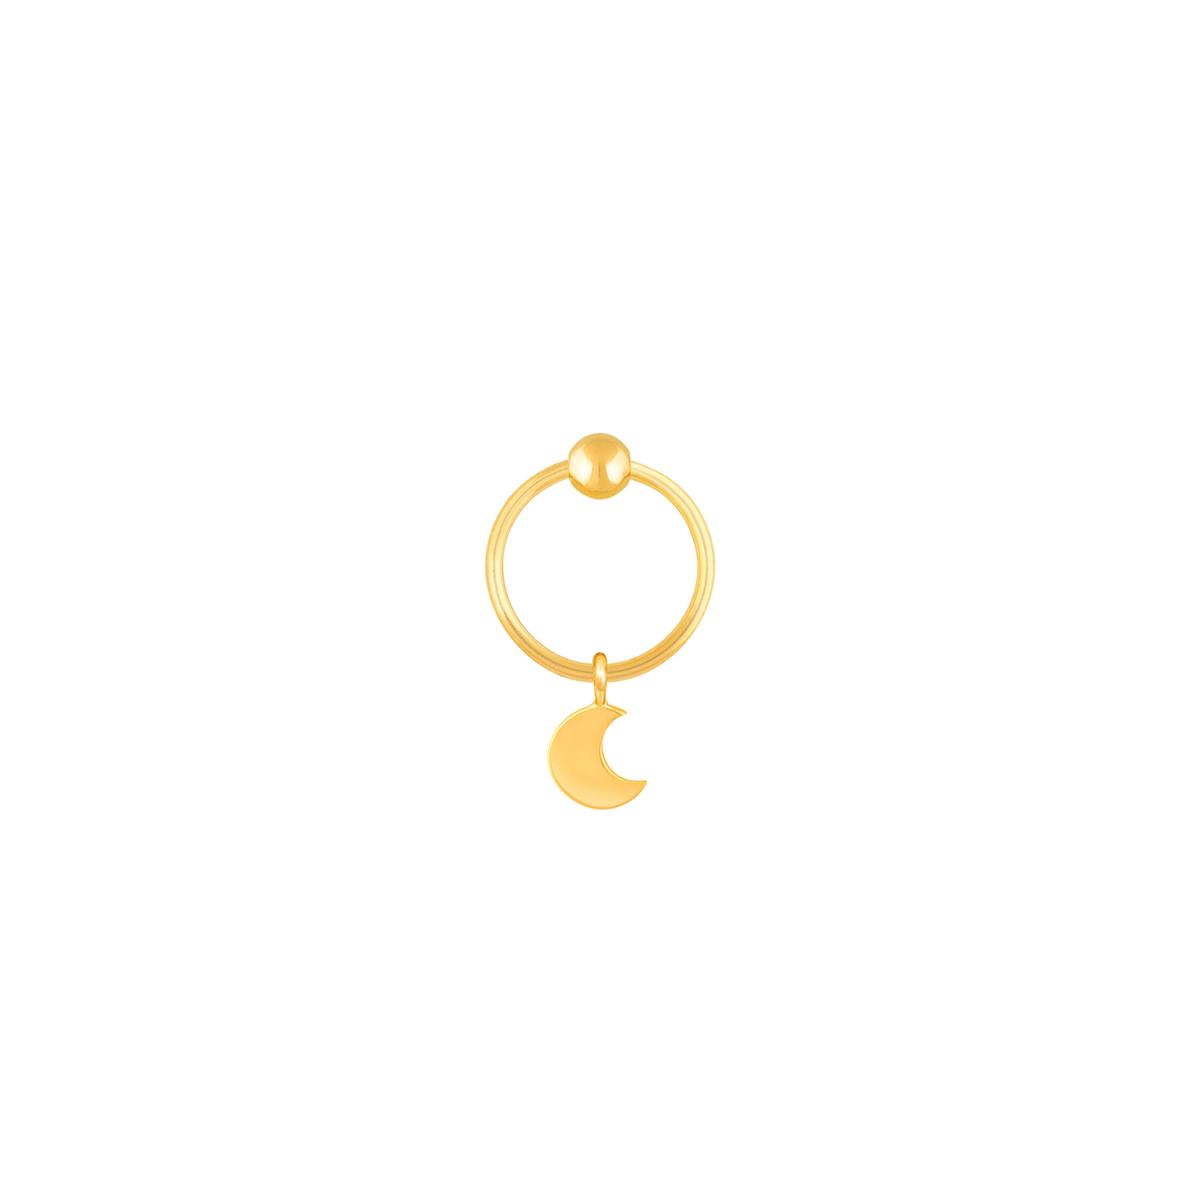 گوشواره طلا تک لنگه ای ماه و گوی